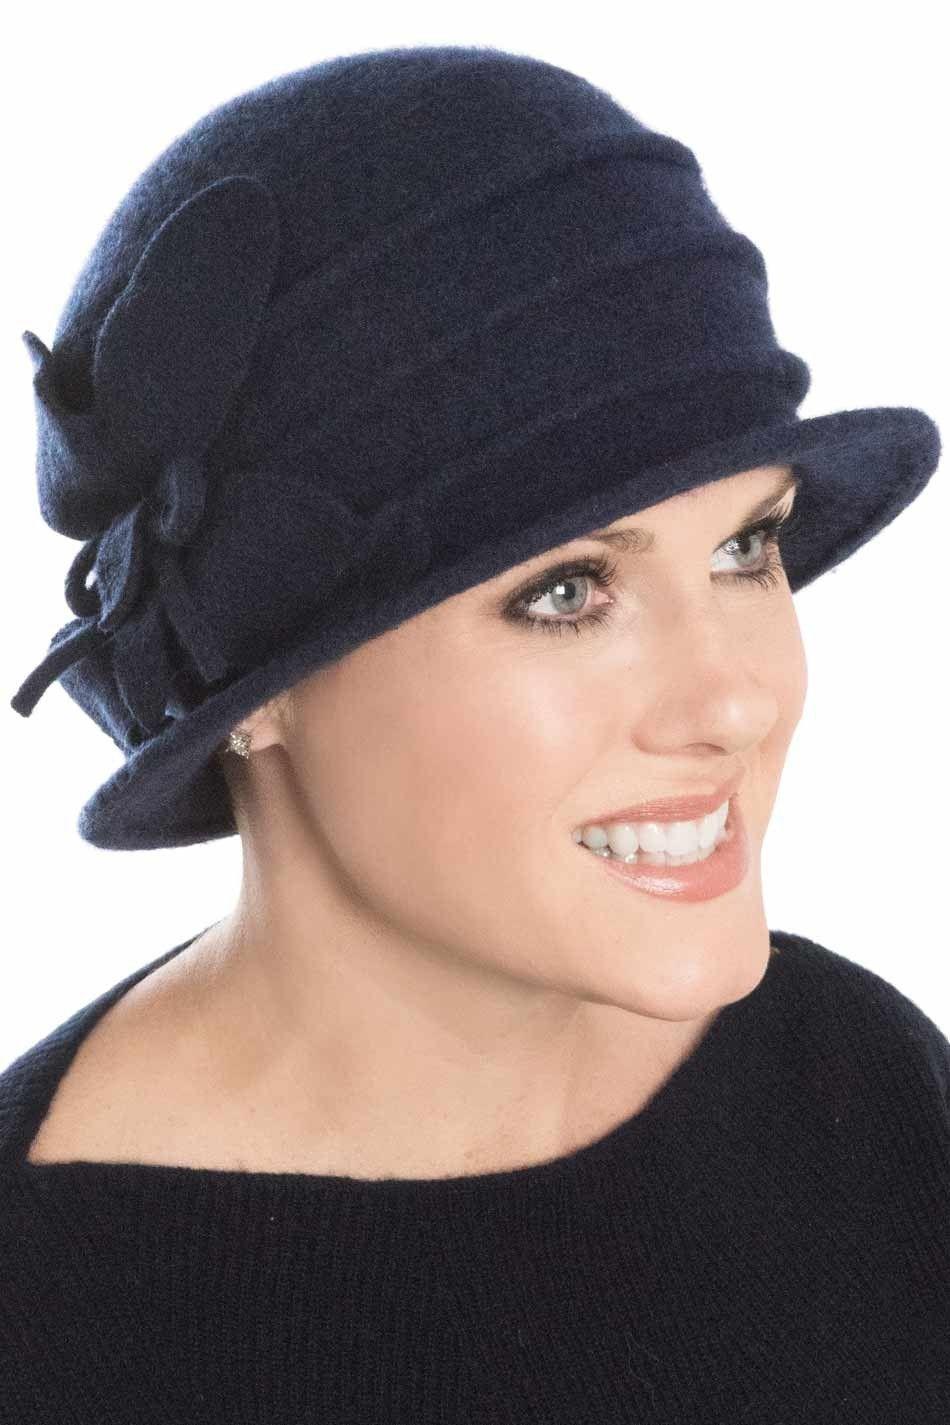 806cd4411bd Fleece Ireland Cloche Hat for Women - Winter Cancer   Chemo Hat